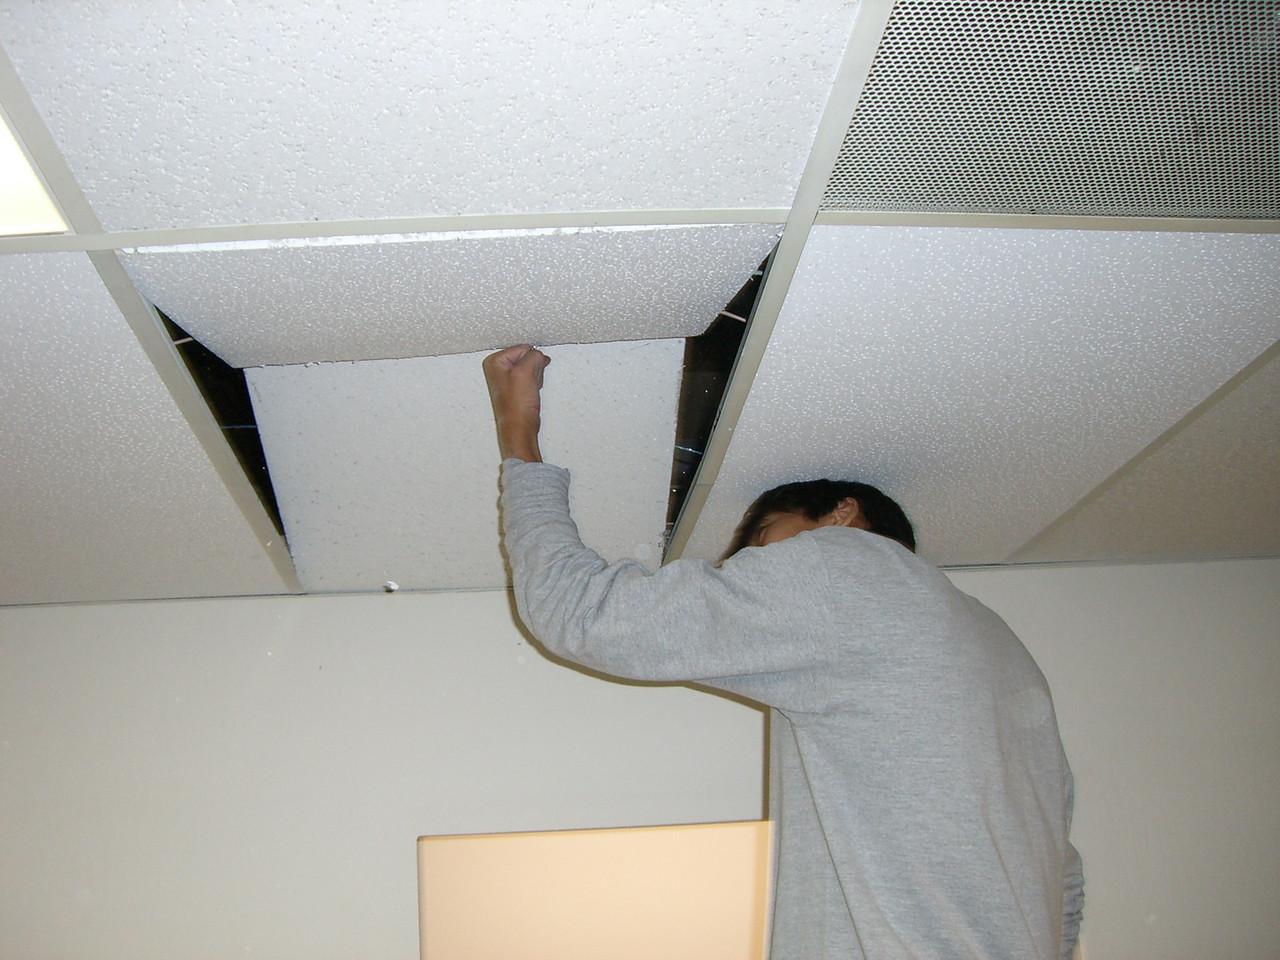 Doug Kang spreading the asbestos joy